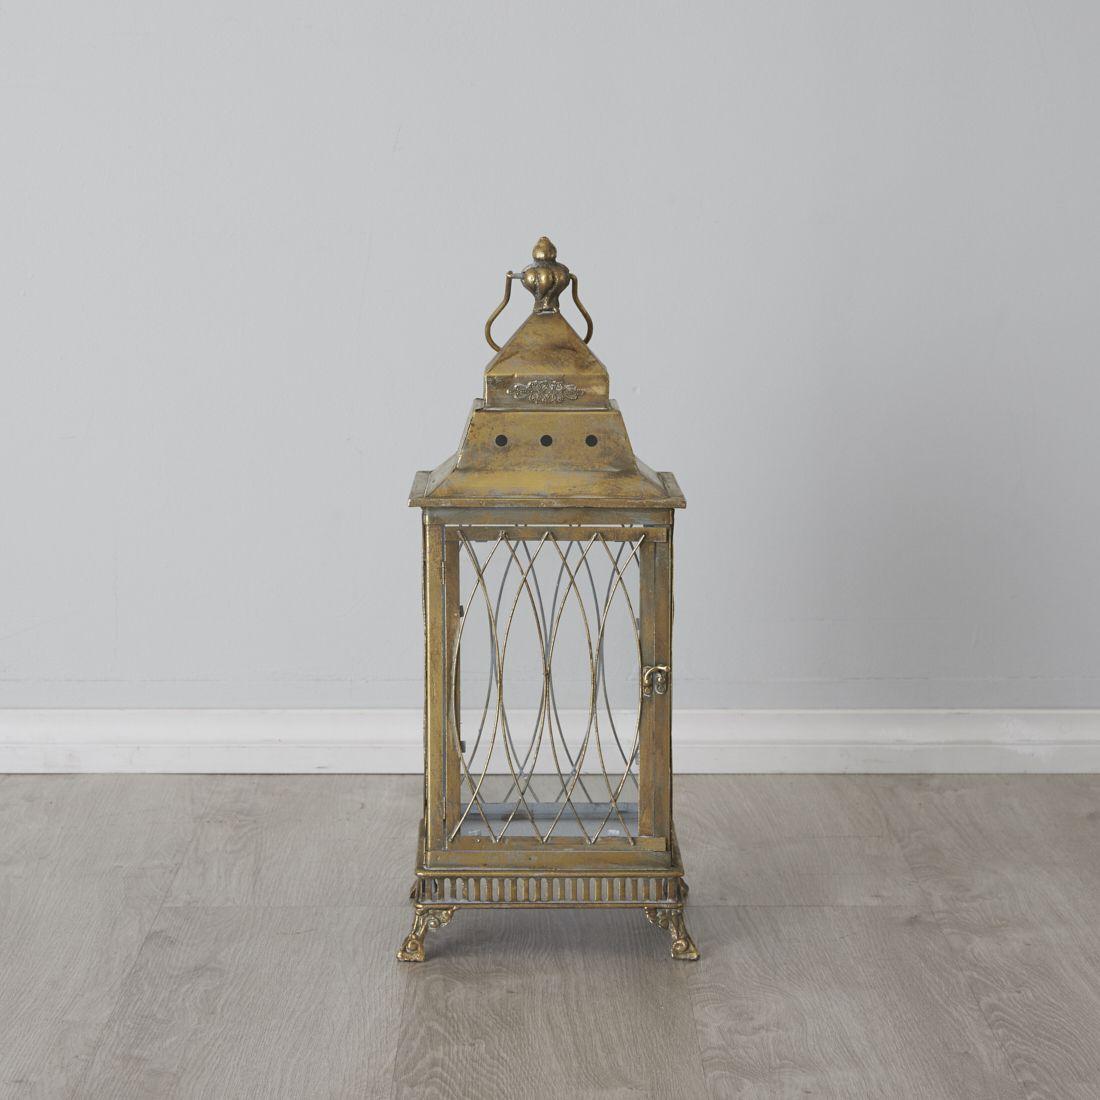 Intricate lantern